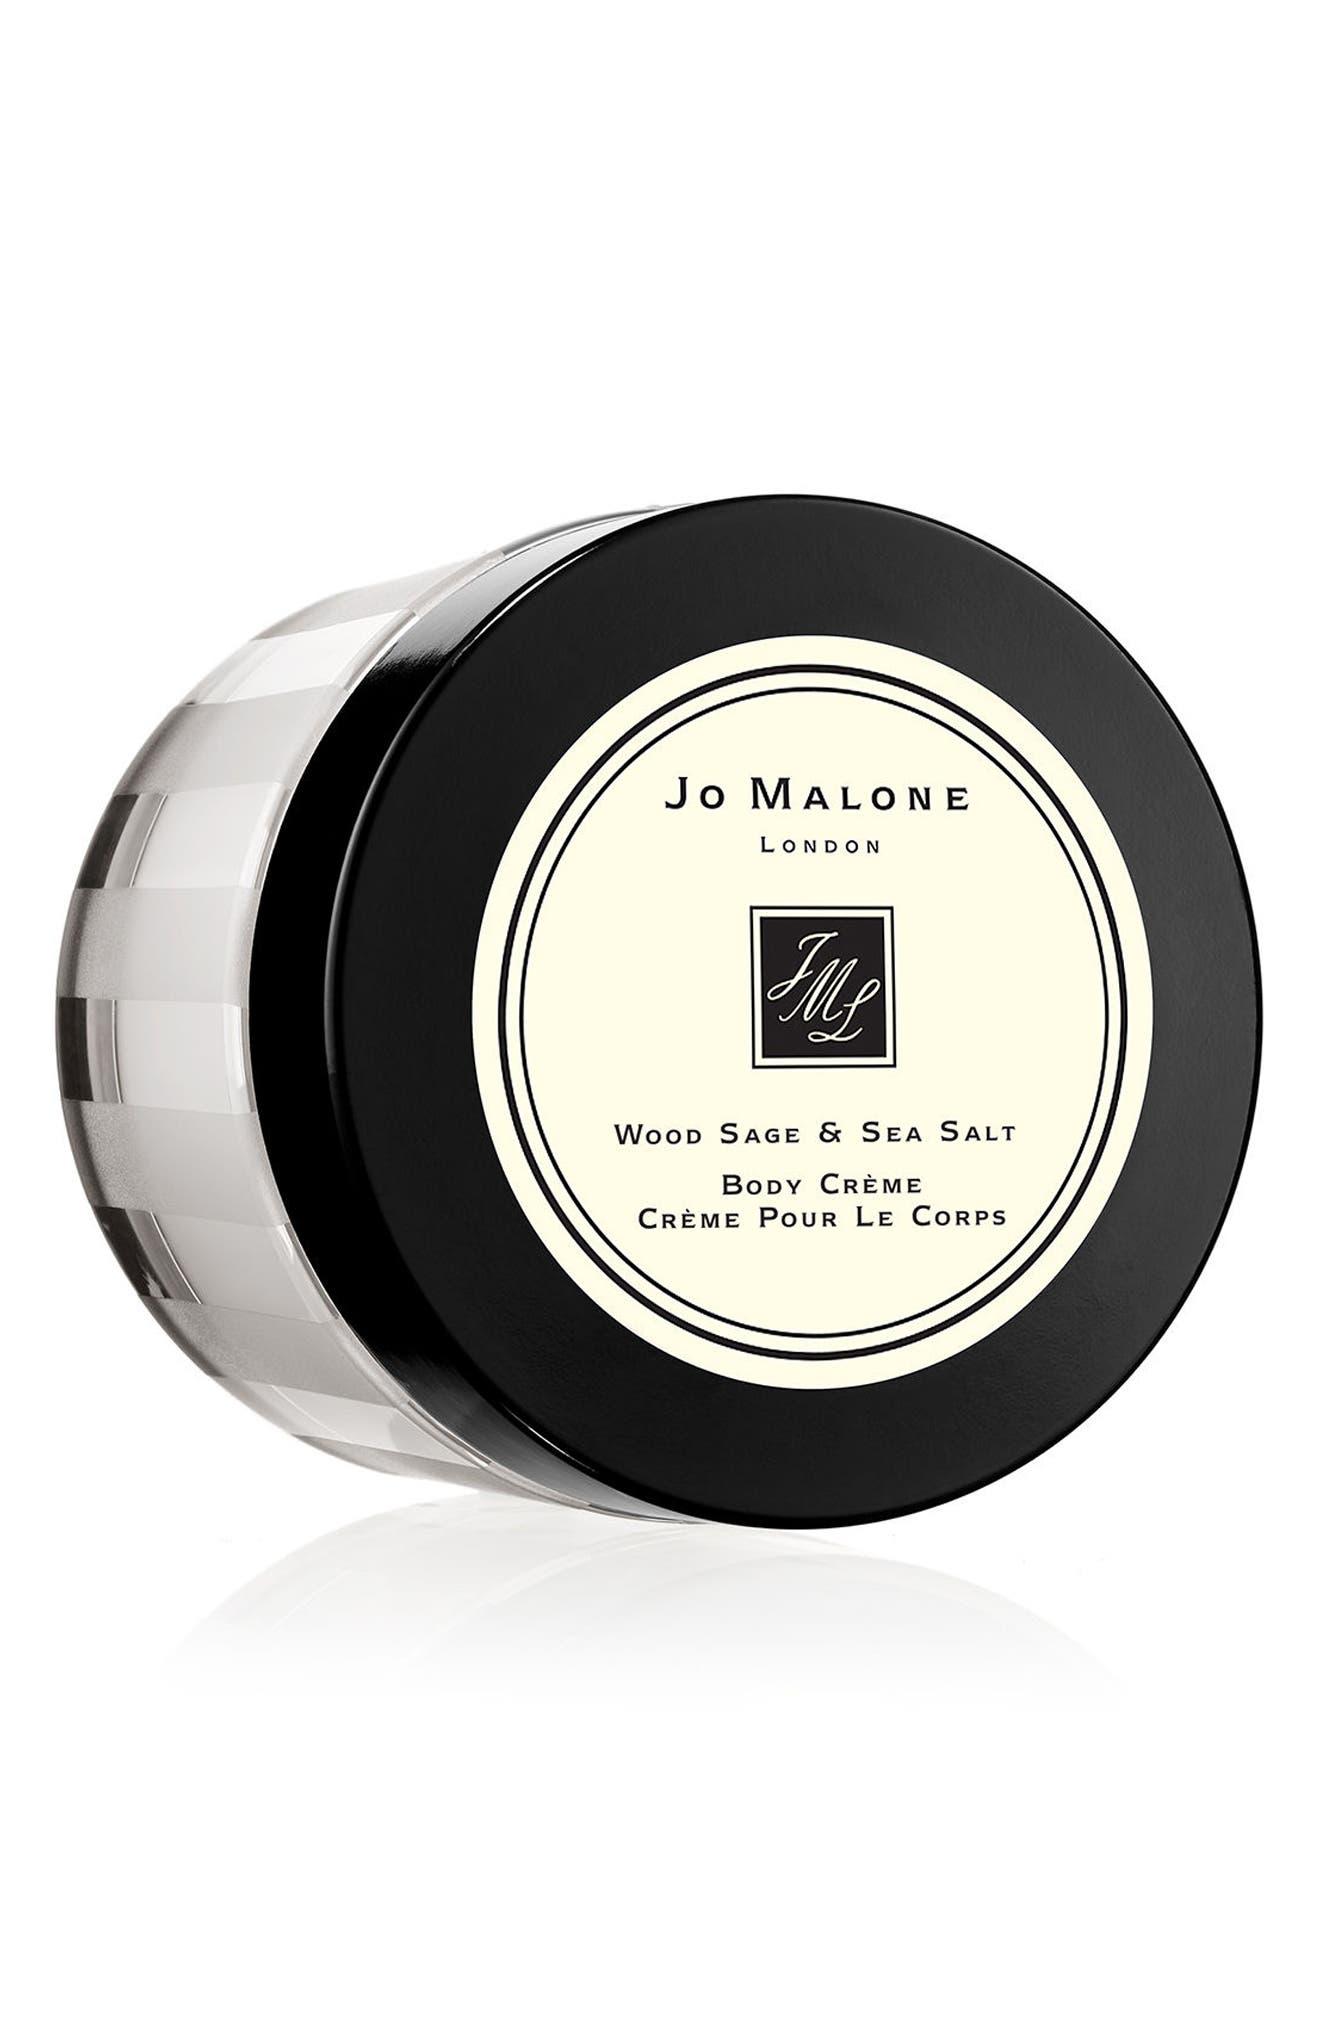 Jo Malone London™ Travel Wood Sage & Sea Salt Body Crème